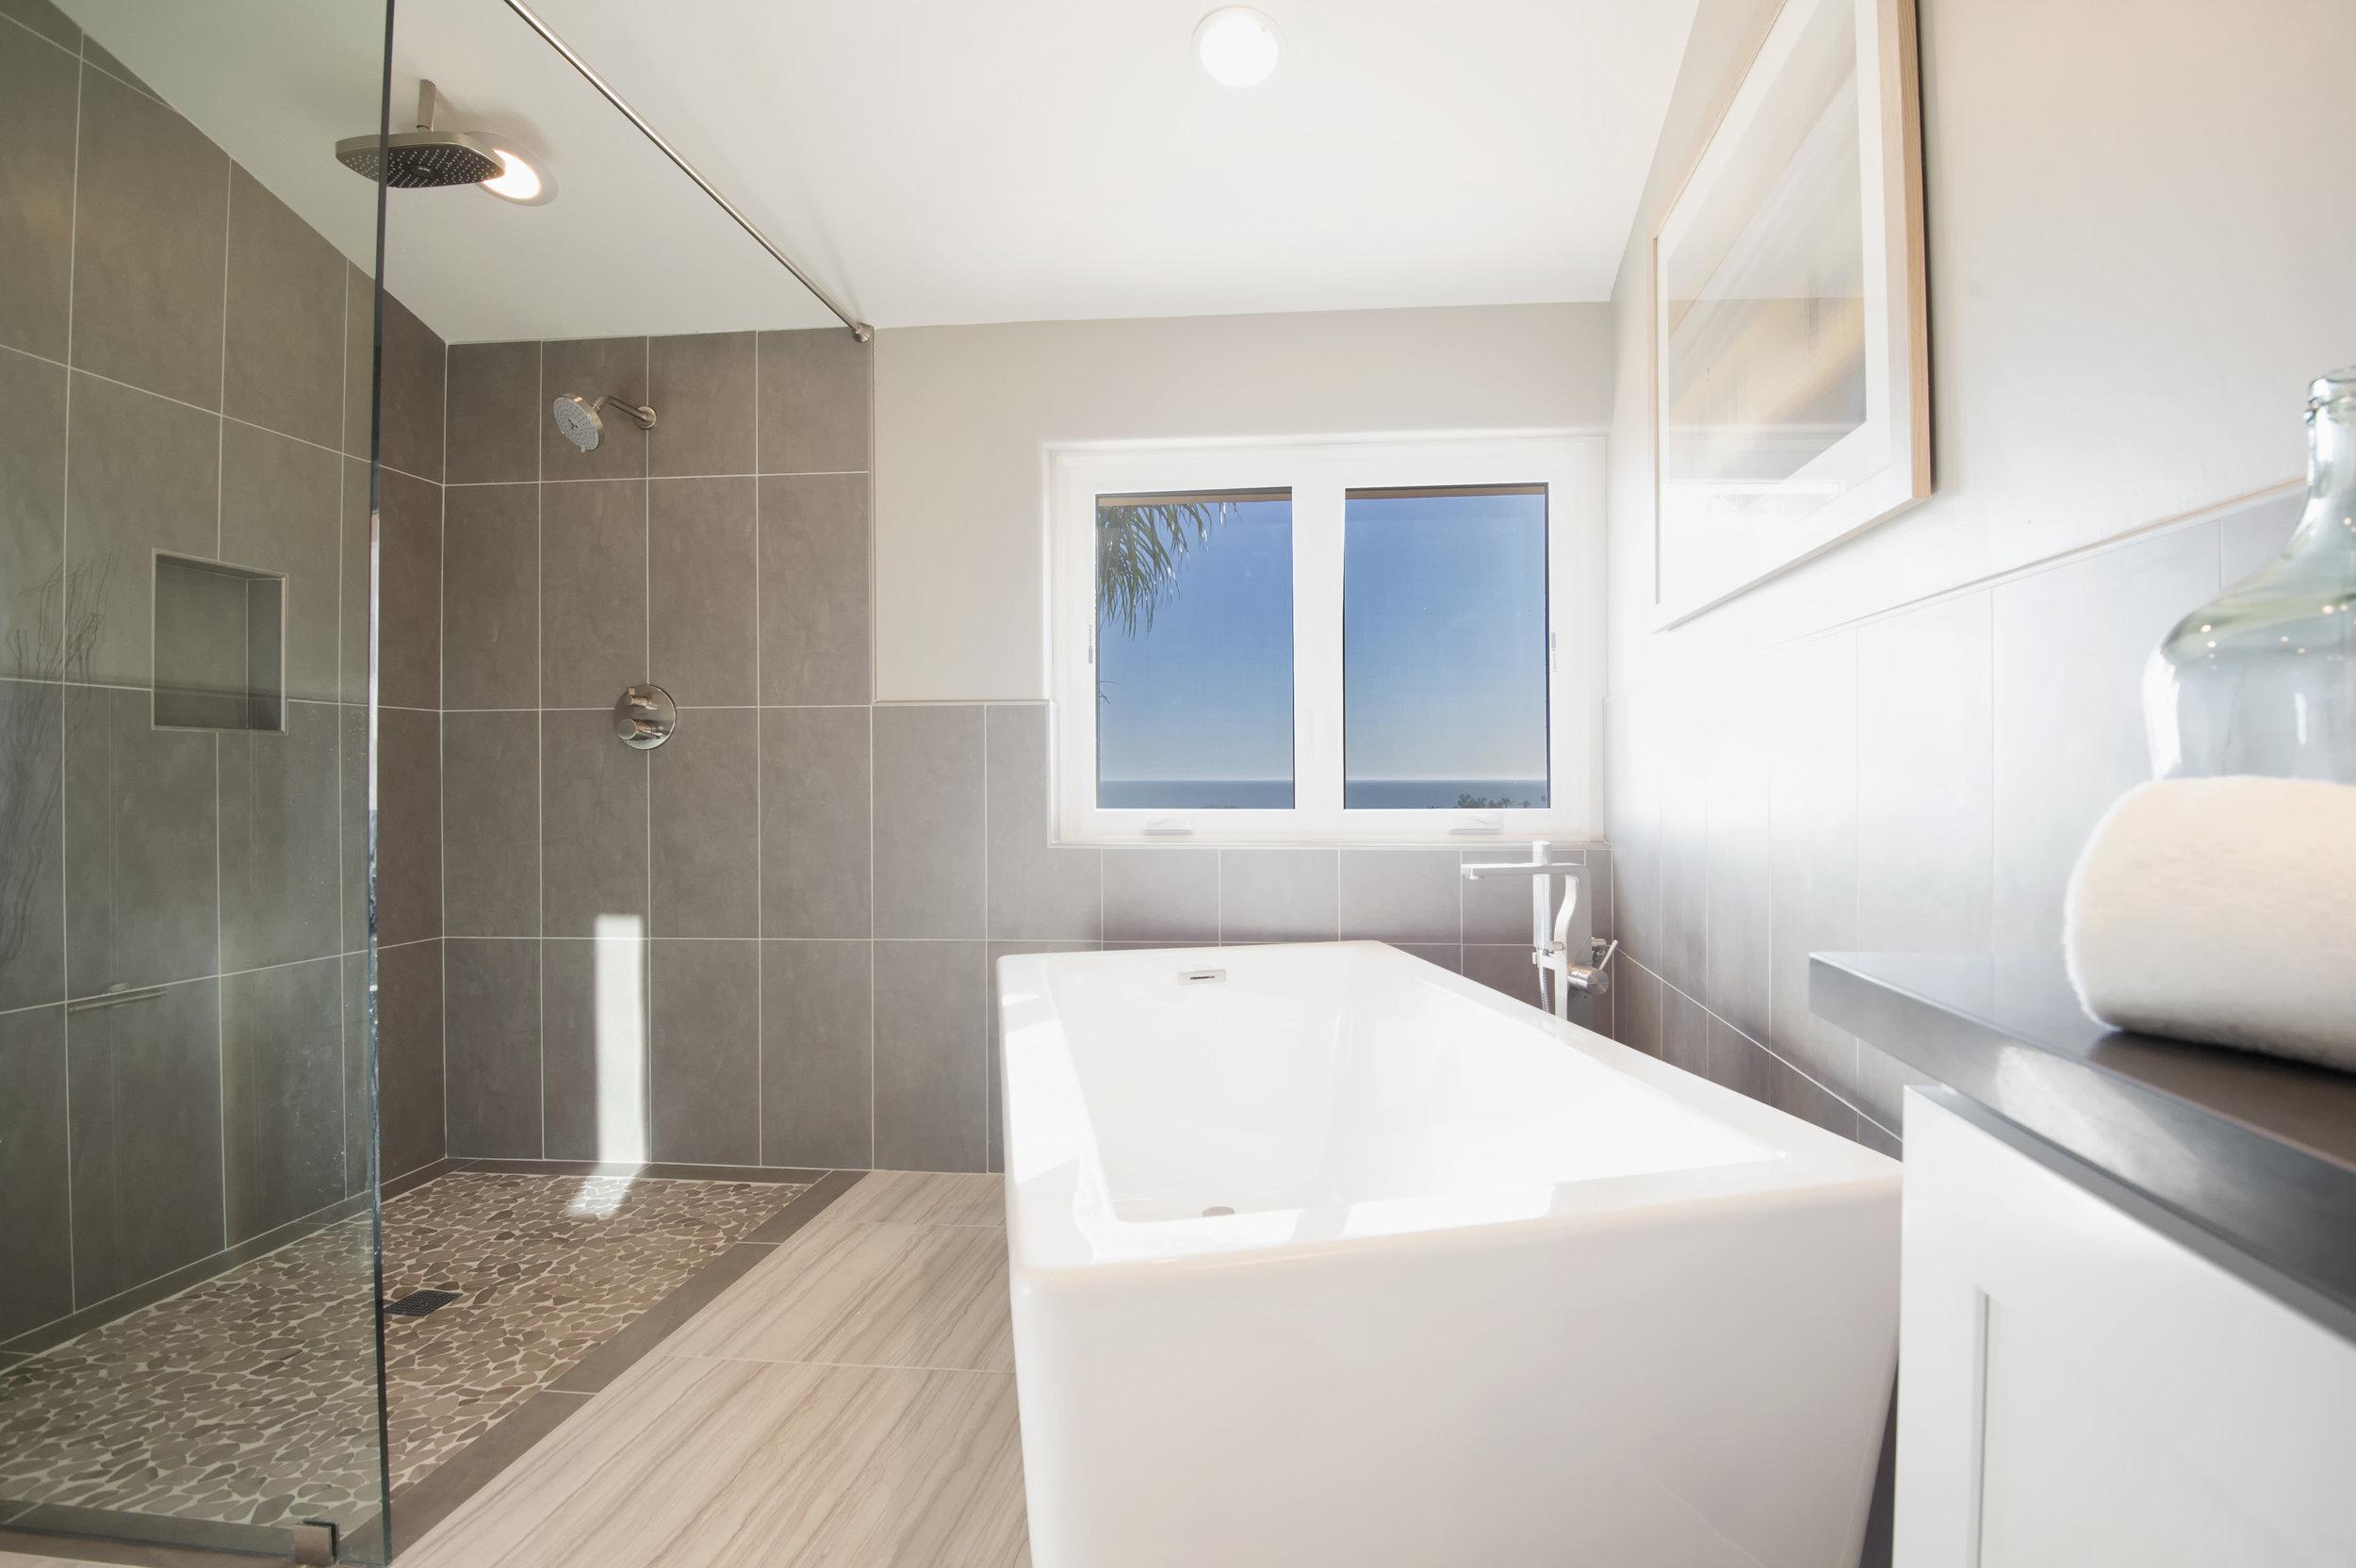 012 6130 Via Cabrillo For Sale Lease The Malibu Life Team Luxury Real Estate.jpg